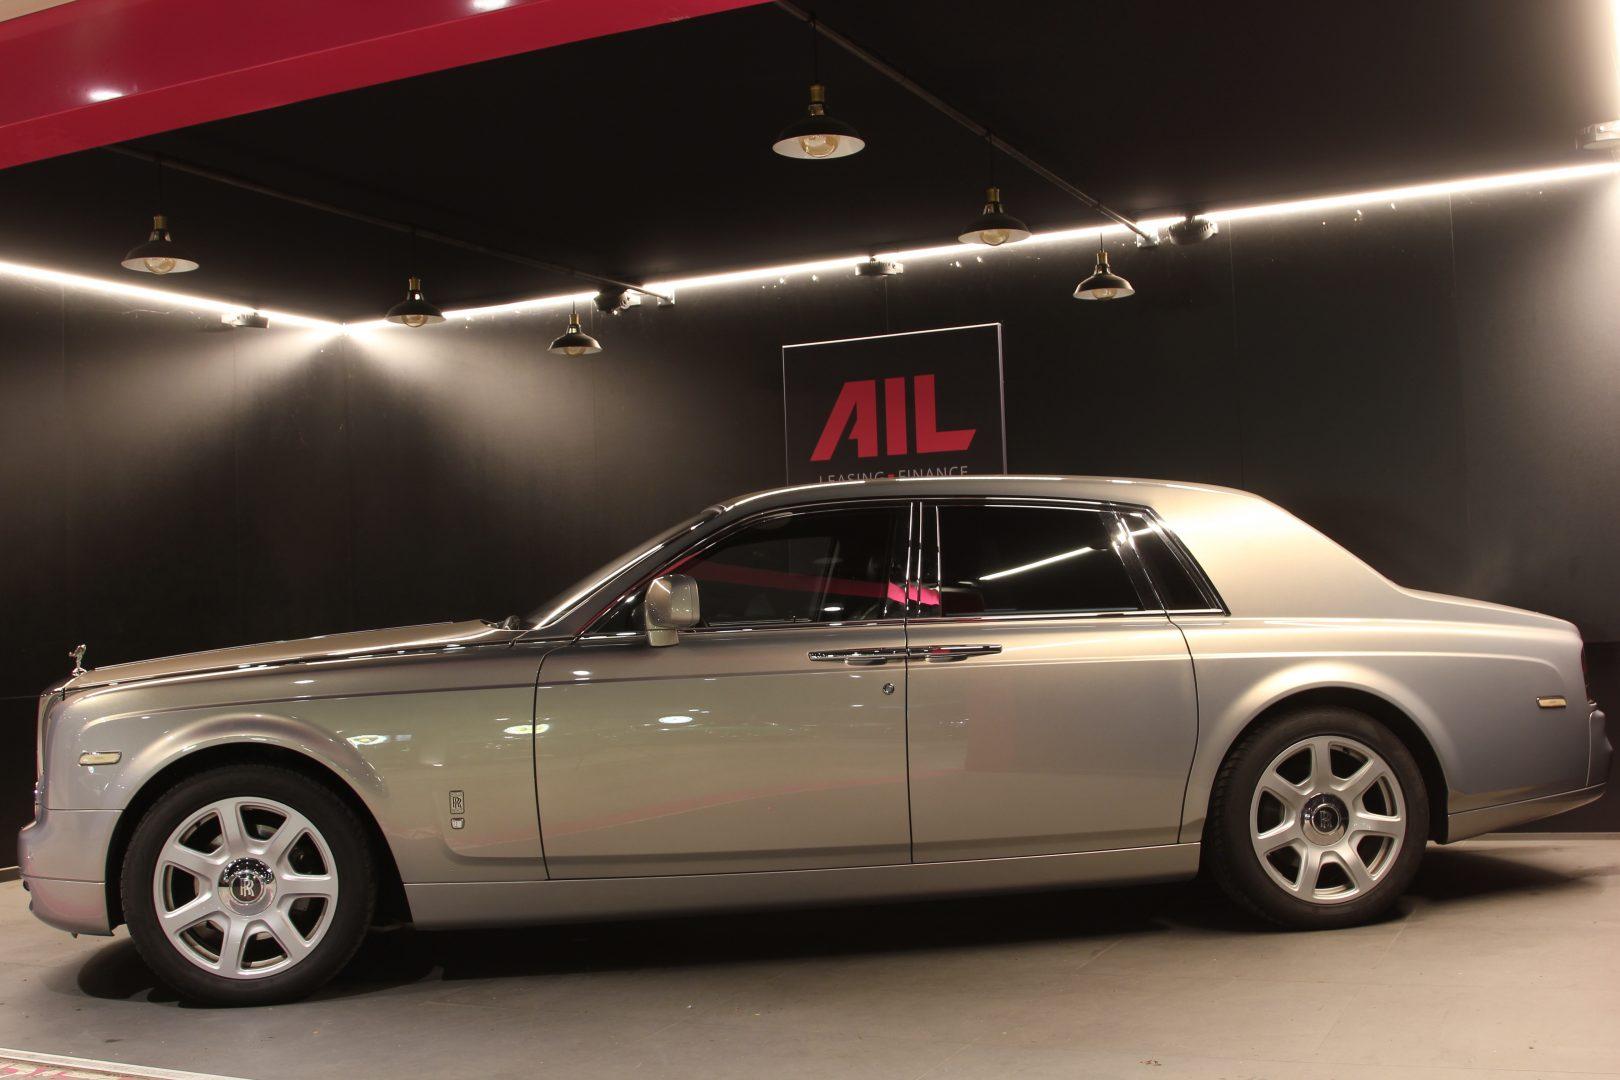 AIL Rolls Royce Phantom Mansory Sternenhimmel  8